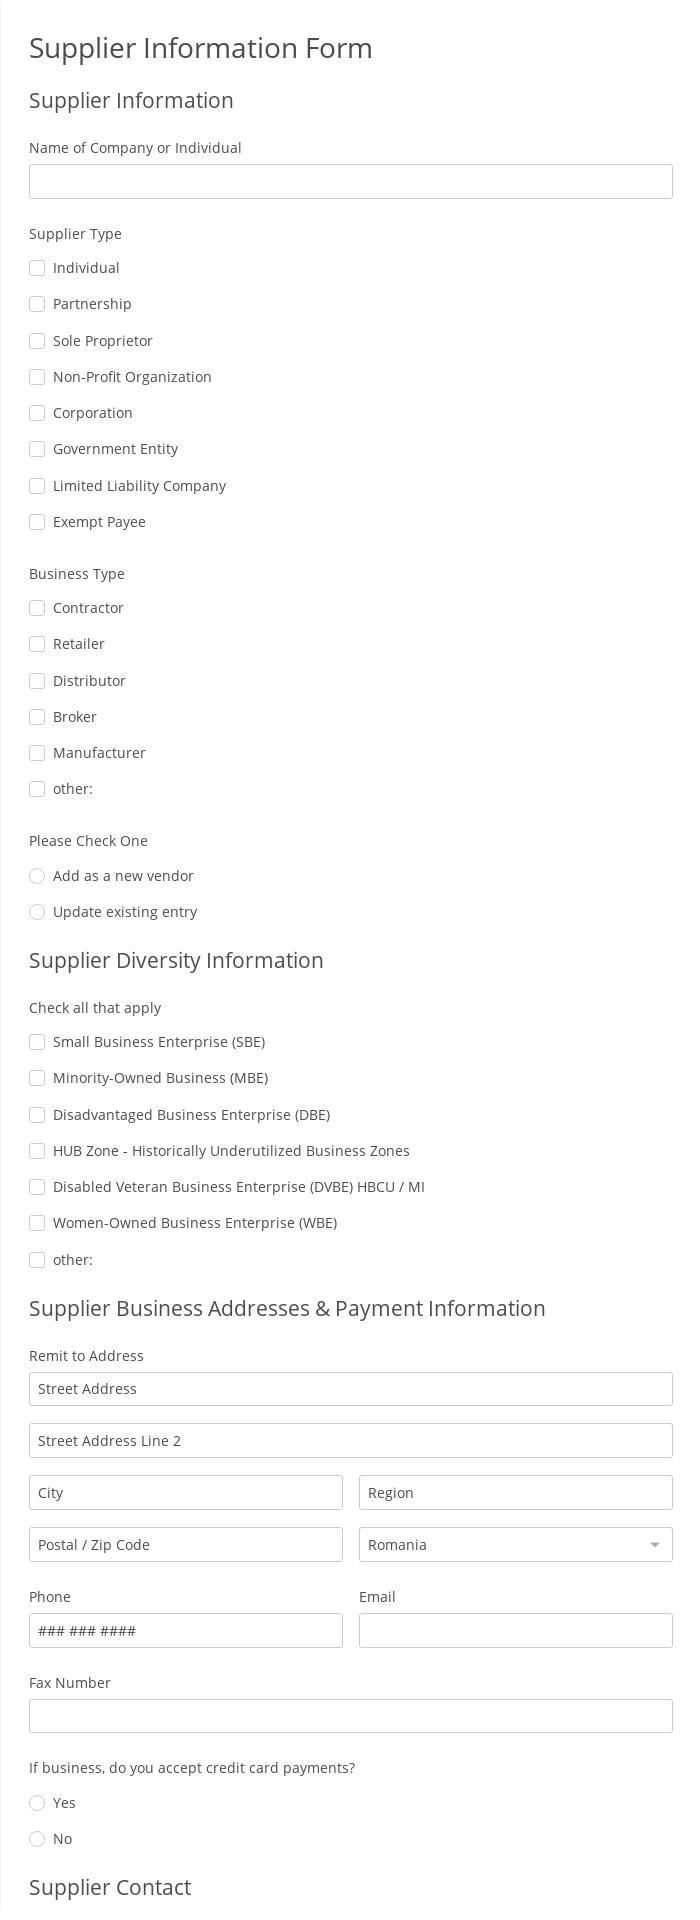 Supplier Information Form